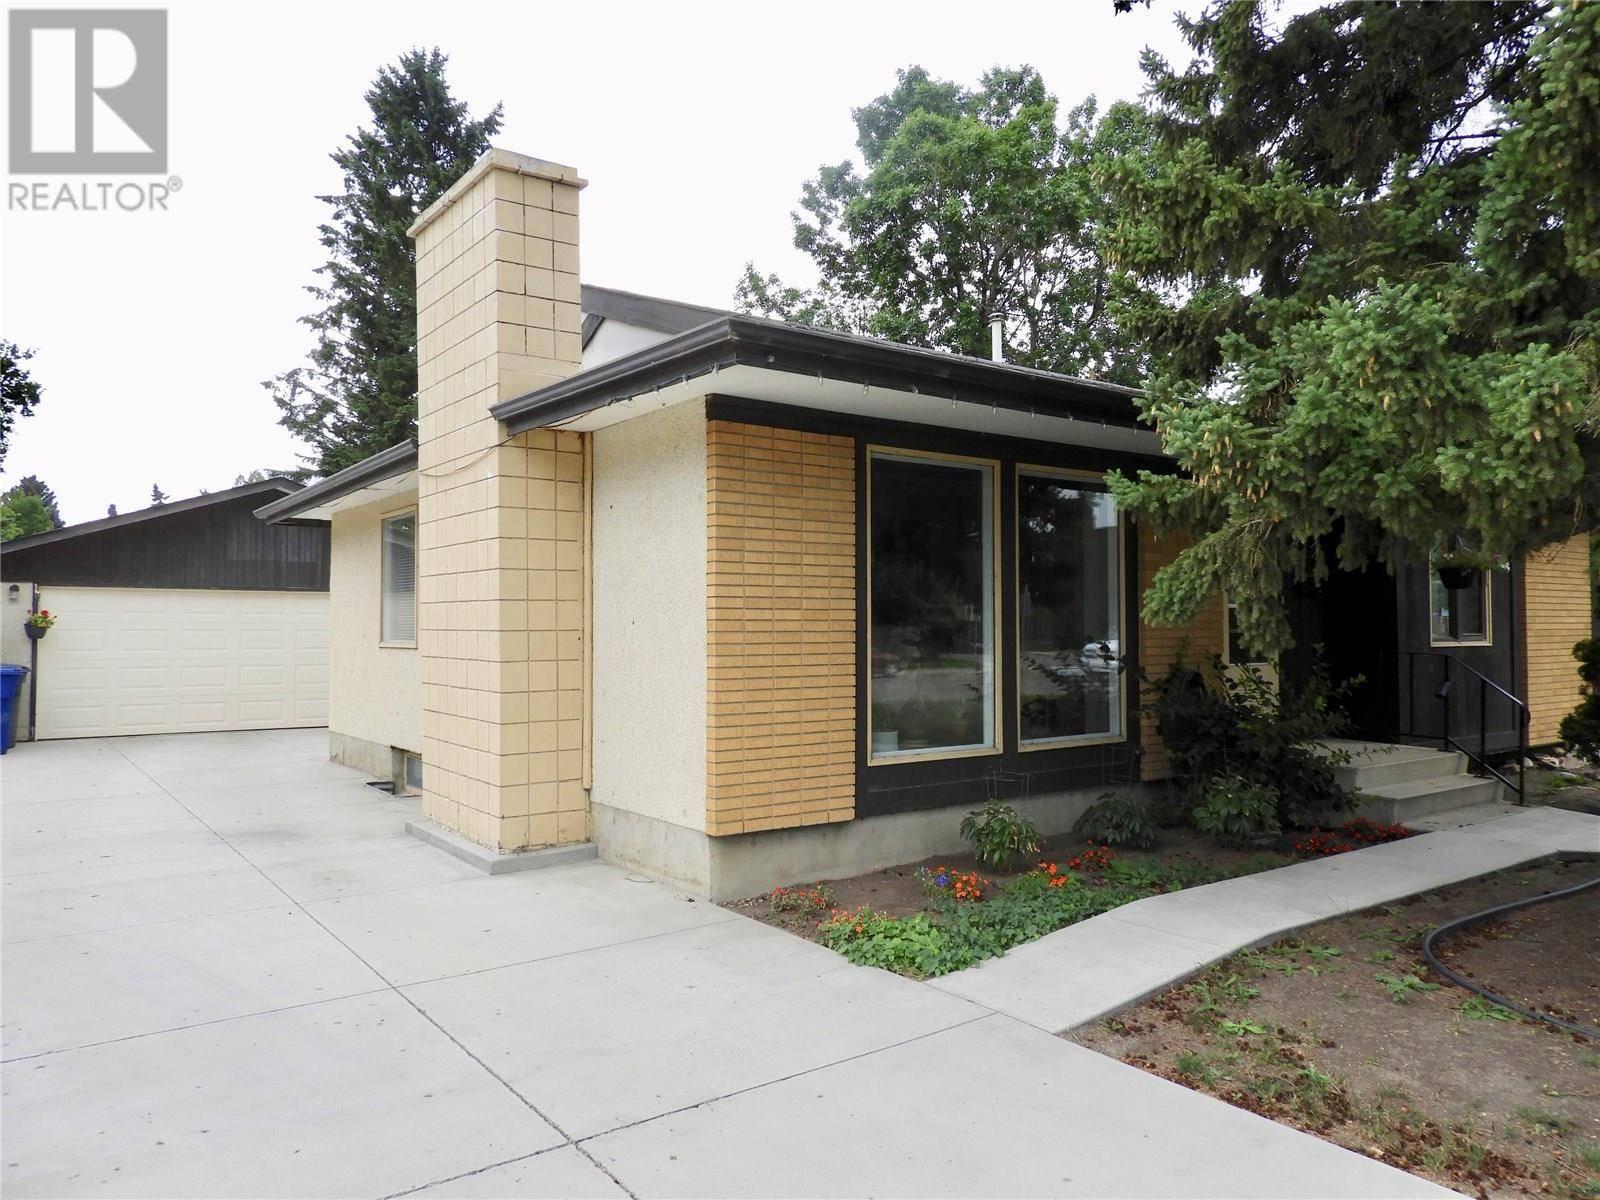 House for sale at 33 Assiniboine Ave Saskatoon Saskatchewan - MLS: SK784306